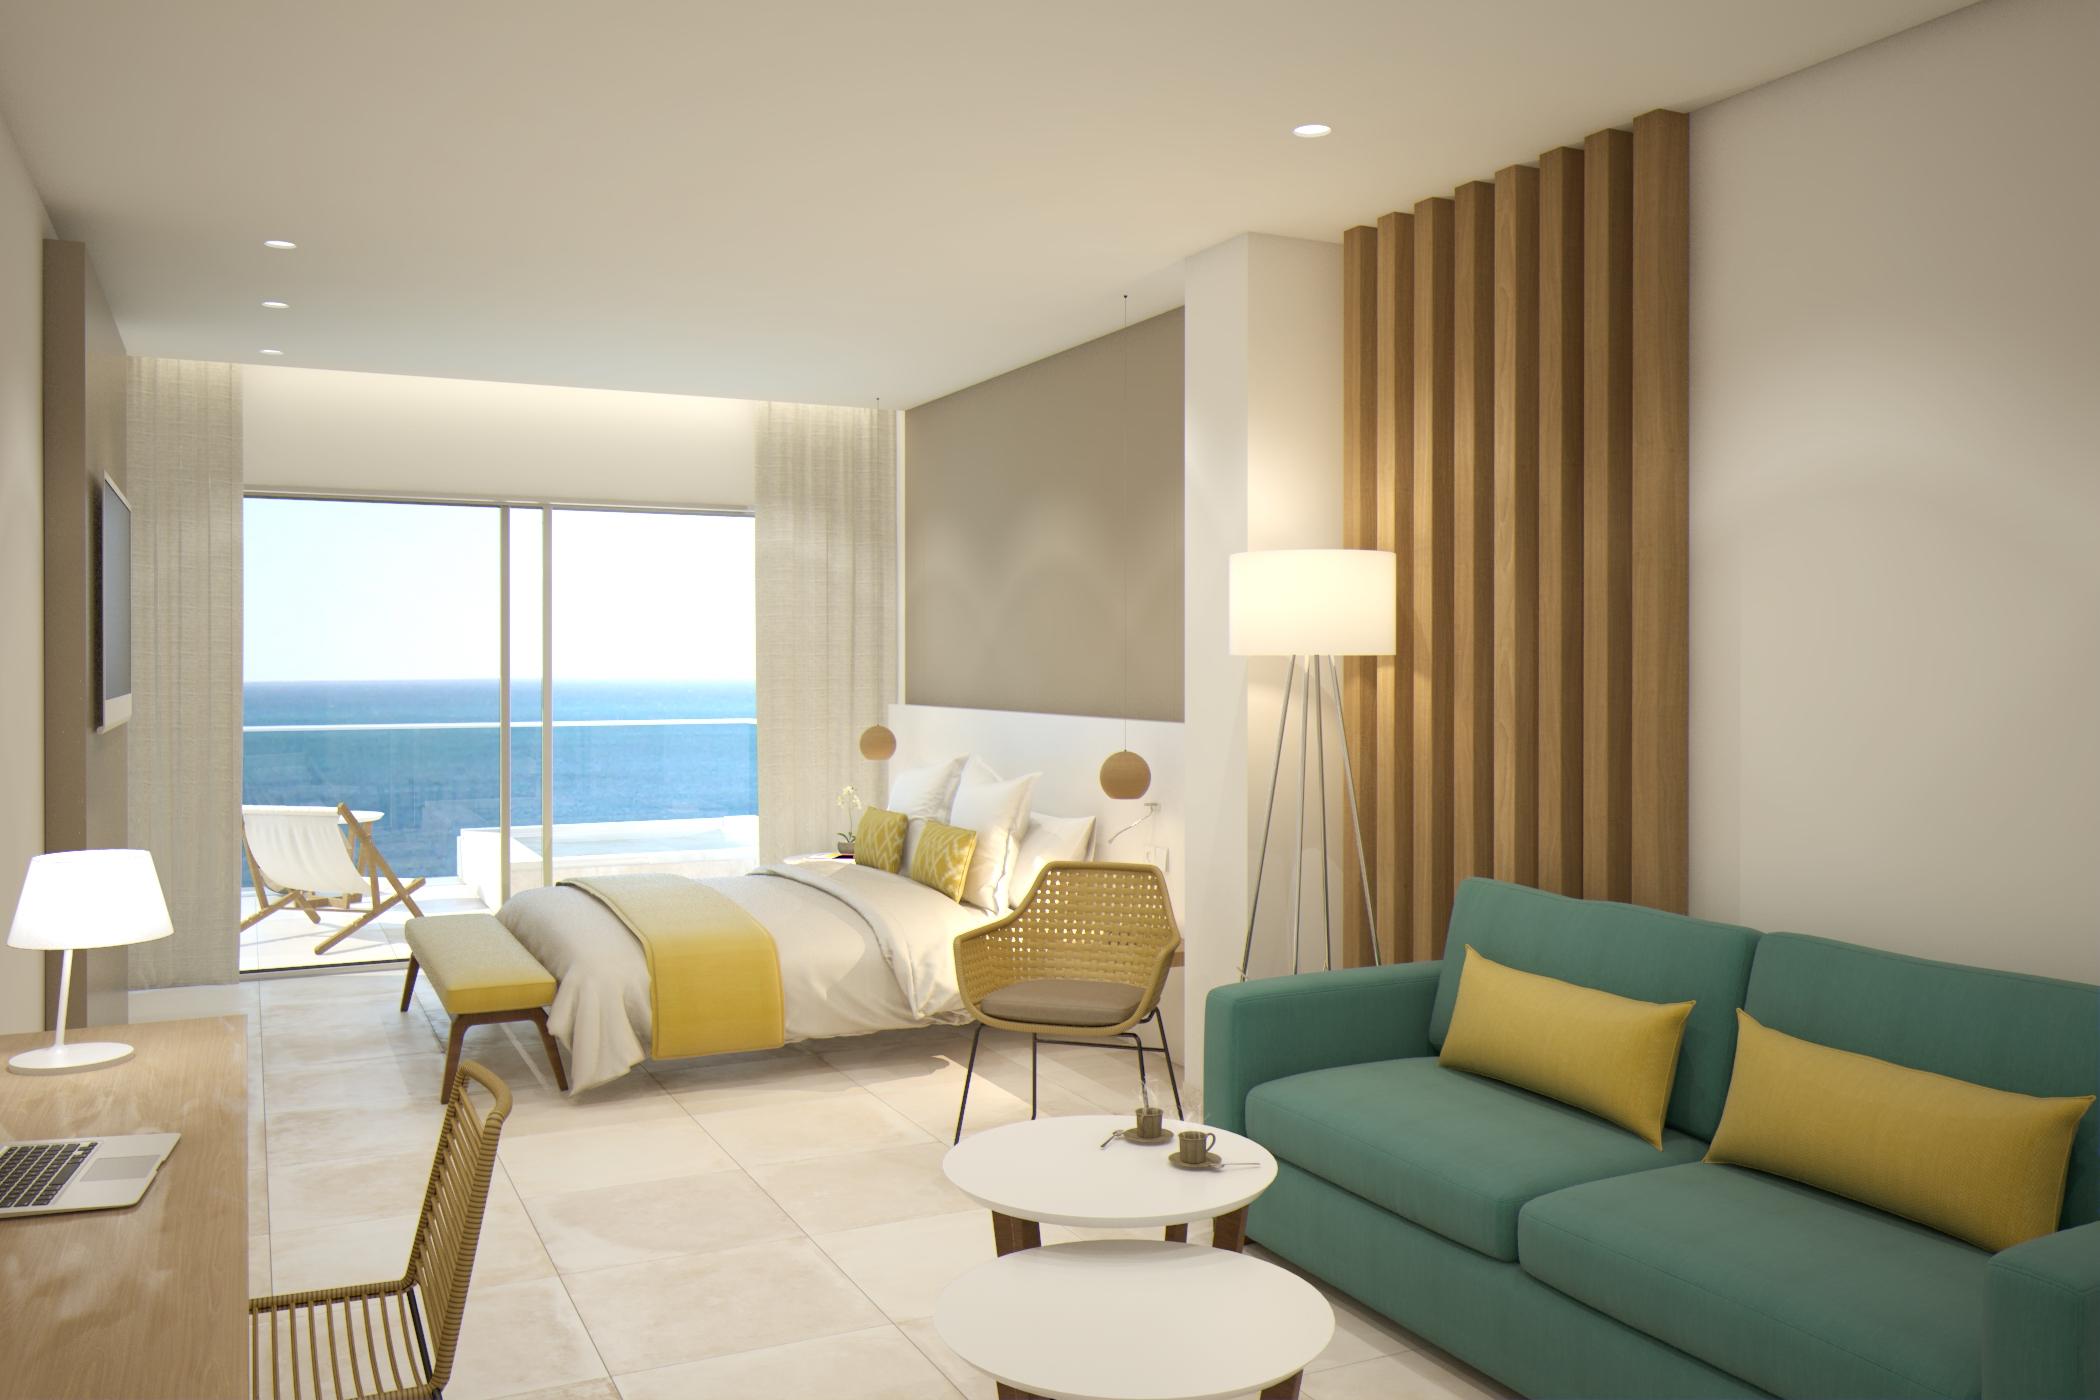 Allsun Ubernimmt Hotel Riviera Playa Auf Mallorca